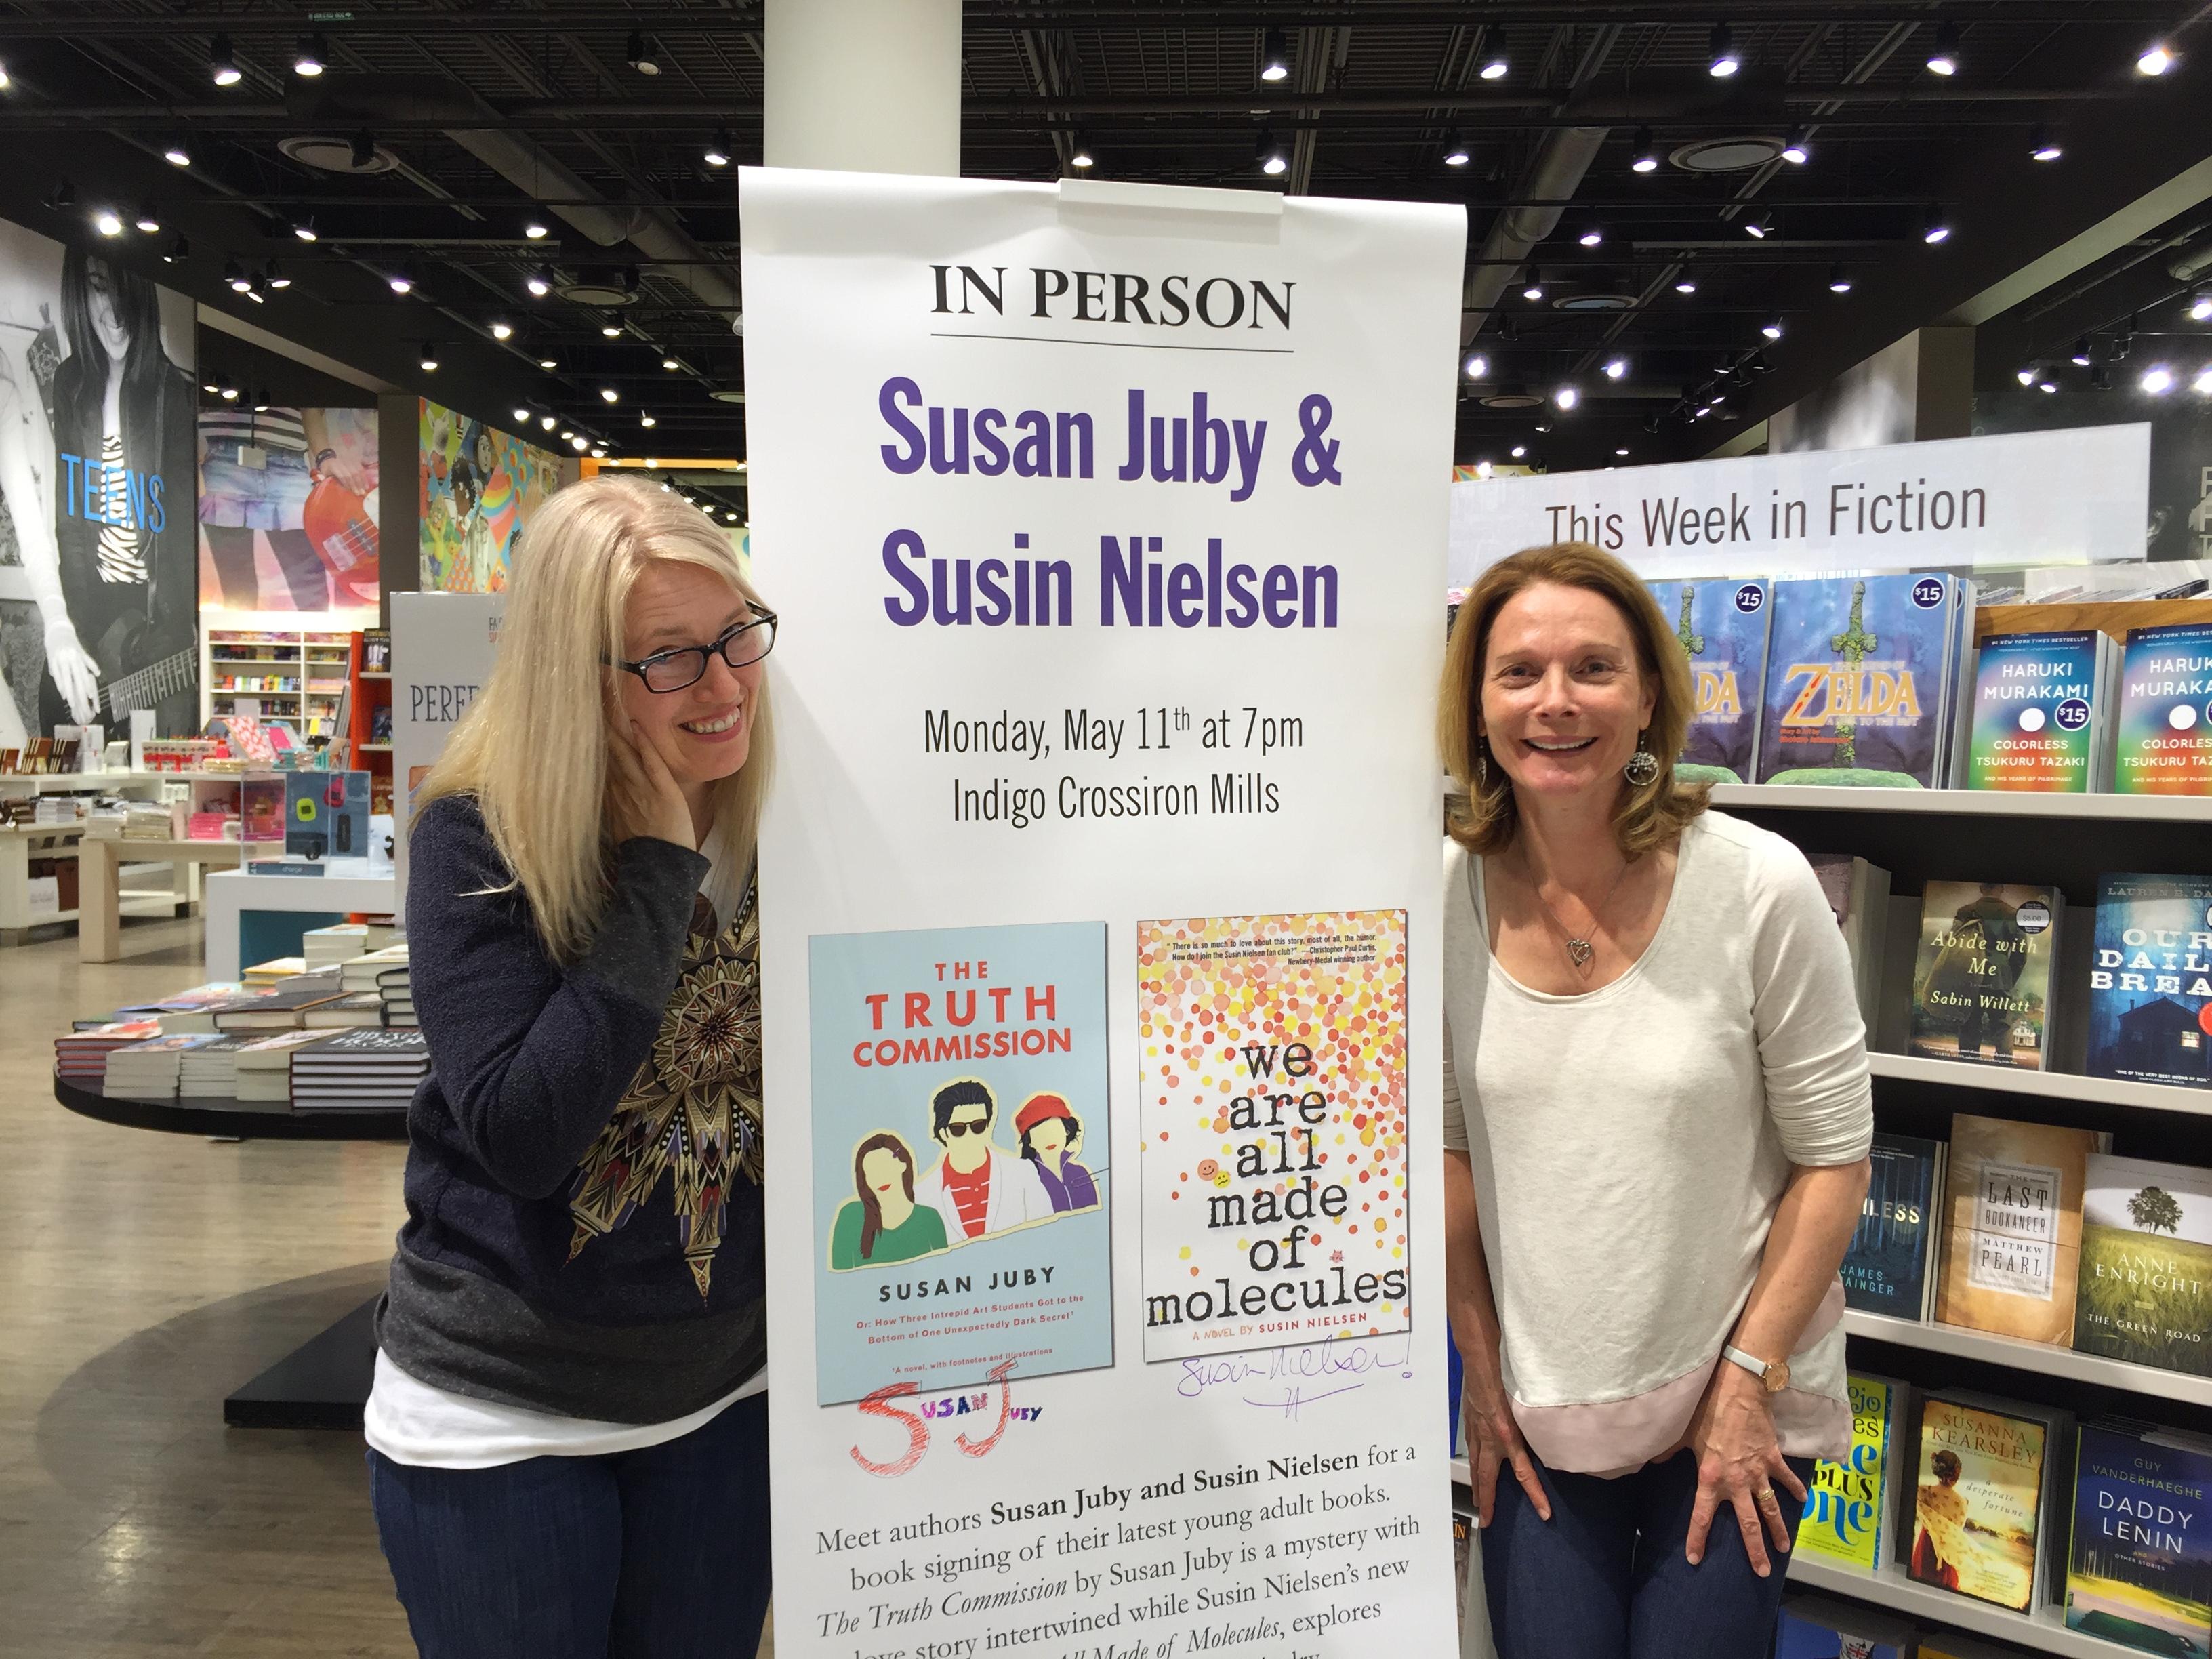 12 Author Days of Christmas - Linda Bailey and Susan Juby